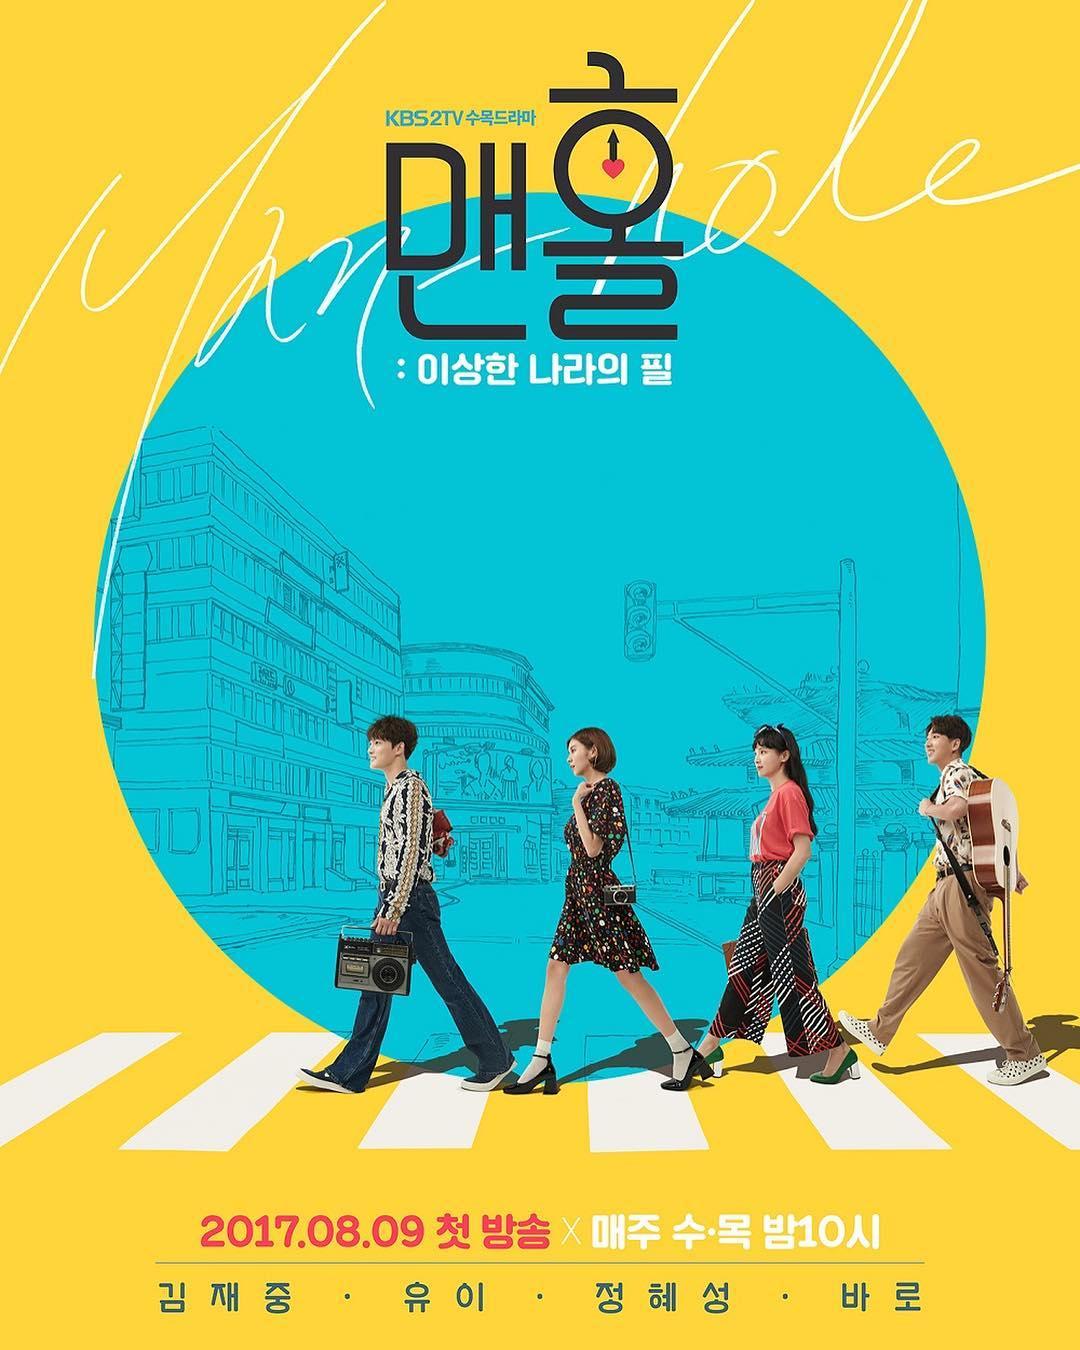 [PIC/SNS] 170727 KBS2 Manhole Drama Main Poster ft. Kim Jaejoong, UEE, Jung Hyesung & Baro